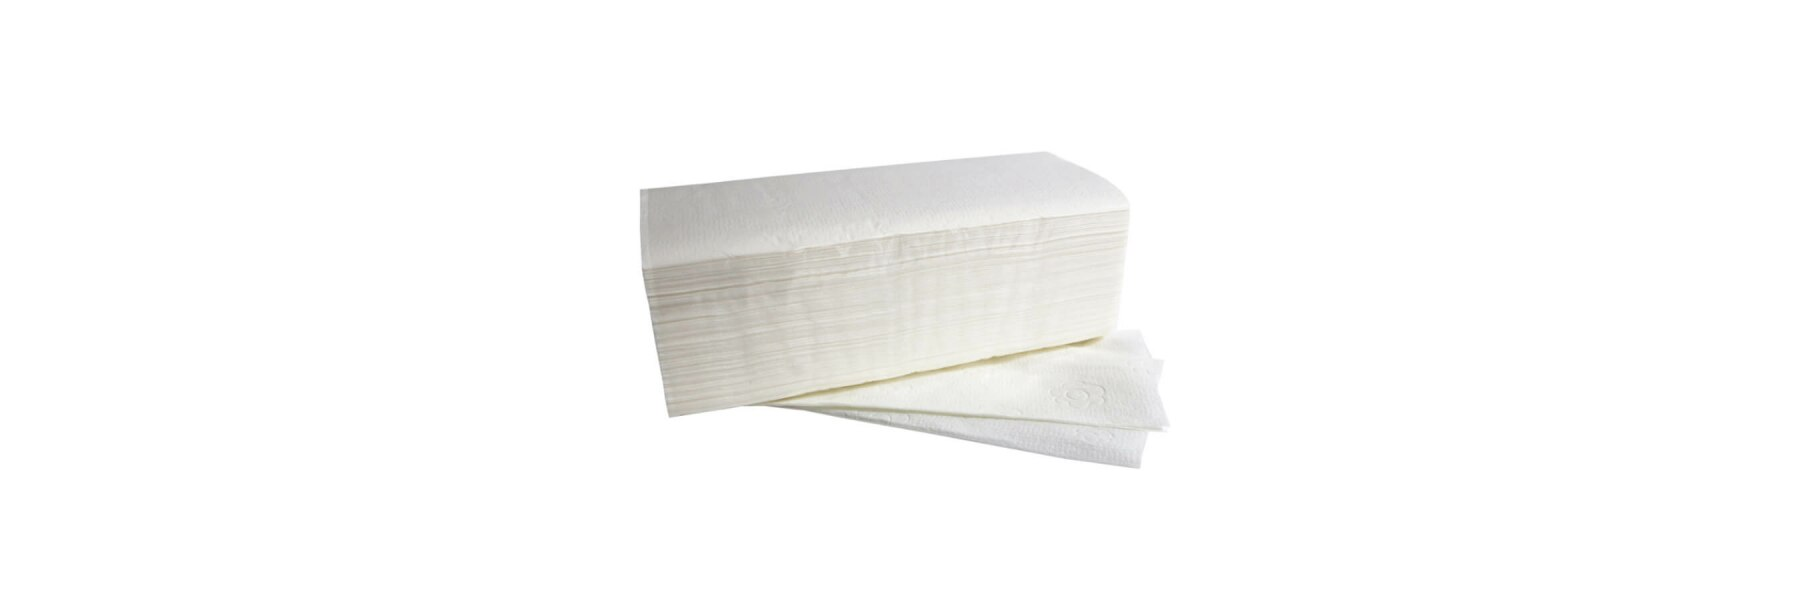 Handtücher- und Papiertücher